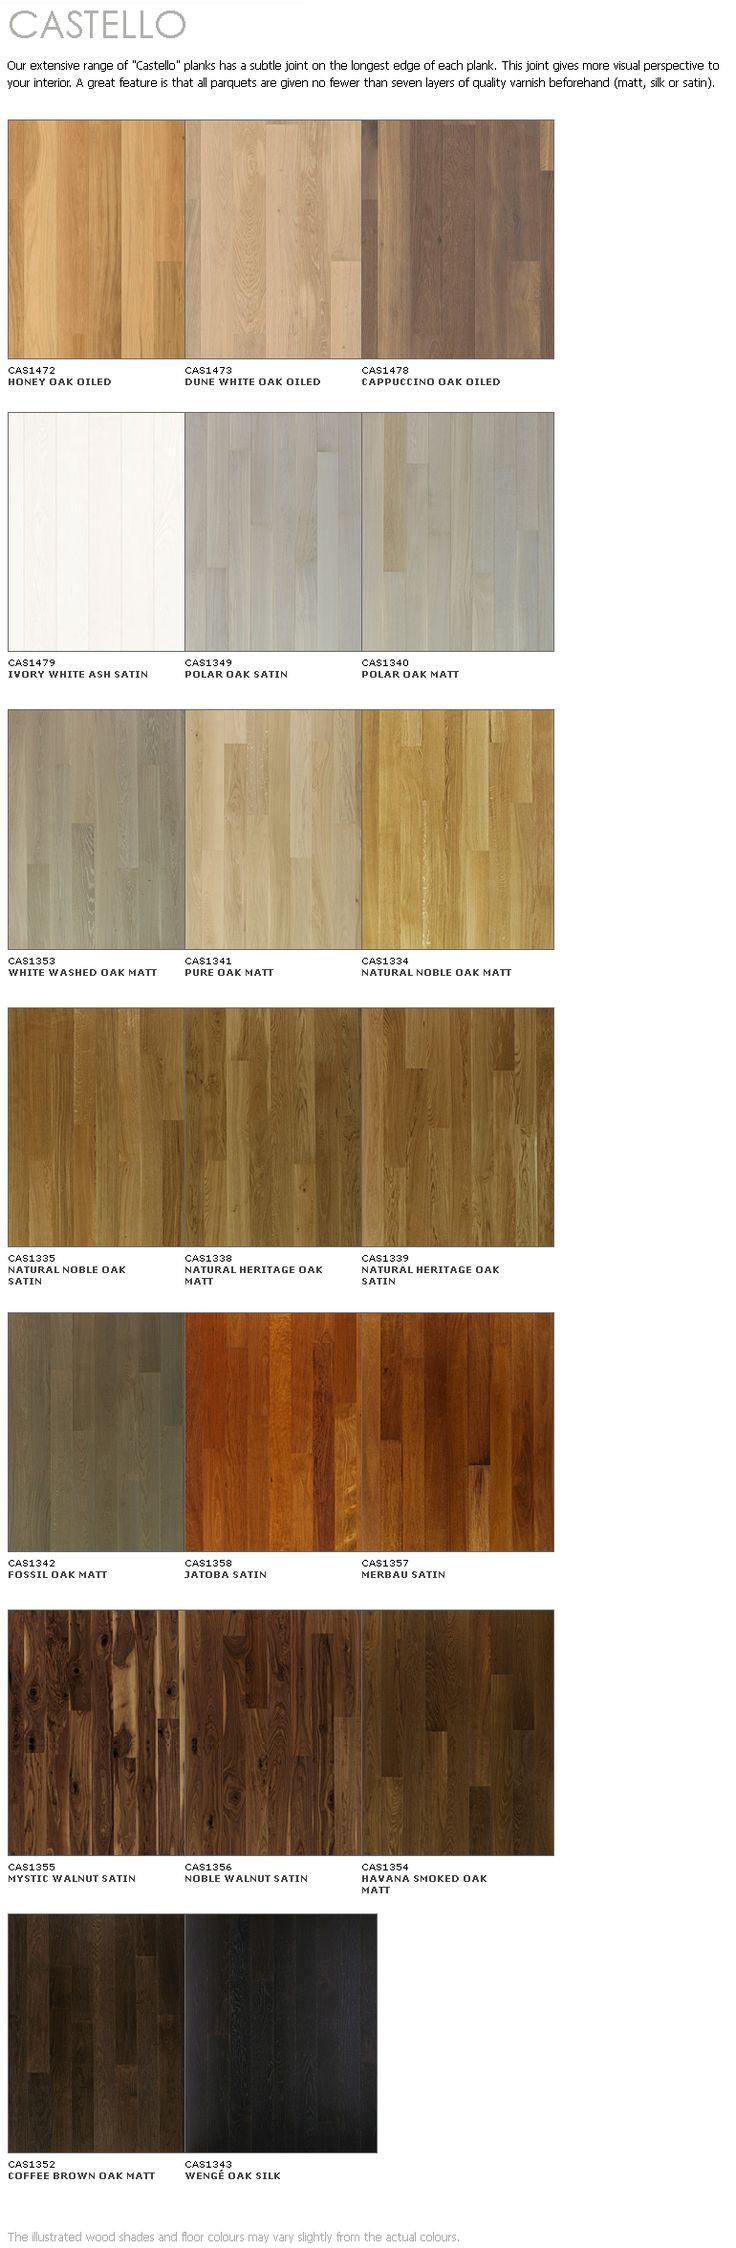 dg hardwood floors of d g heath dgheathtimber on pinterest for 1caa106c32bfcce11089ec3d588055e6 diy wood flooring engineered wood flooring